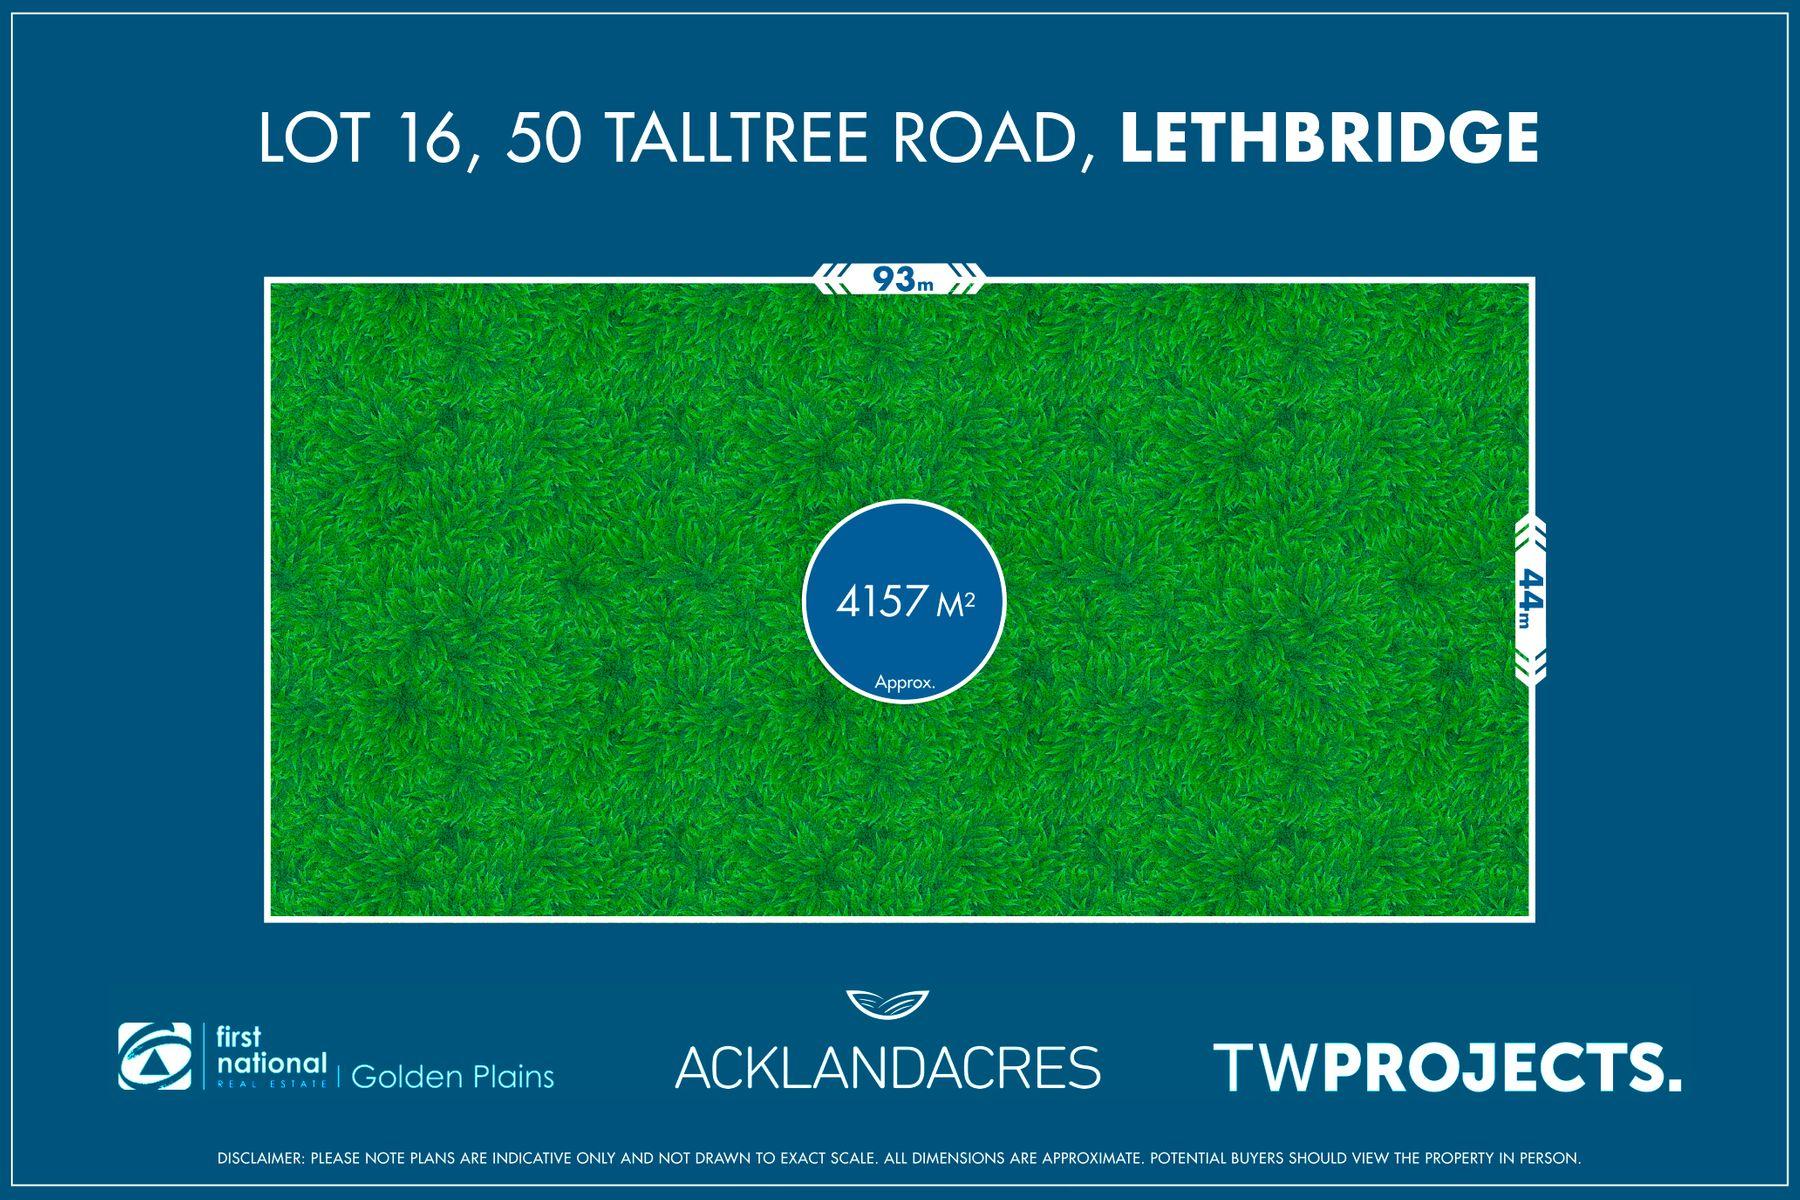 Lot 16, 50 Tall Tree Road, Lethbridge, VIC 3332